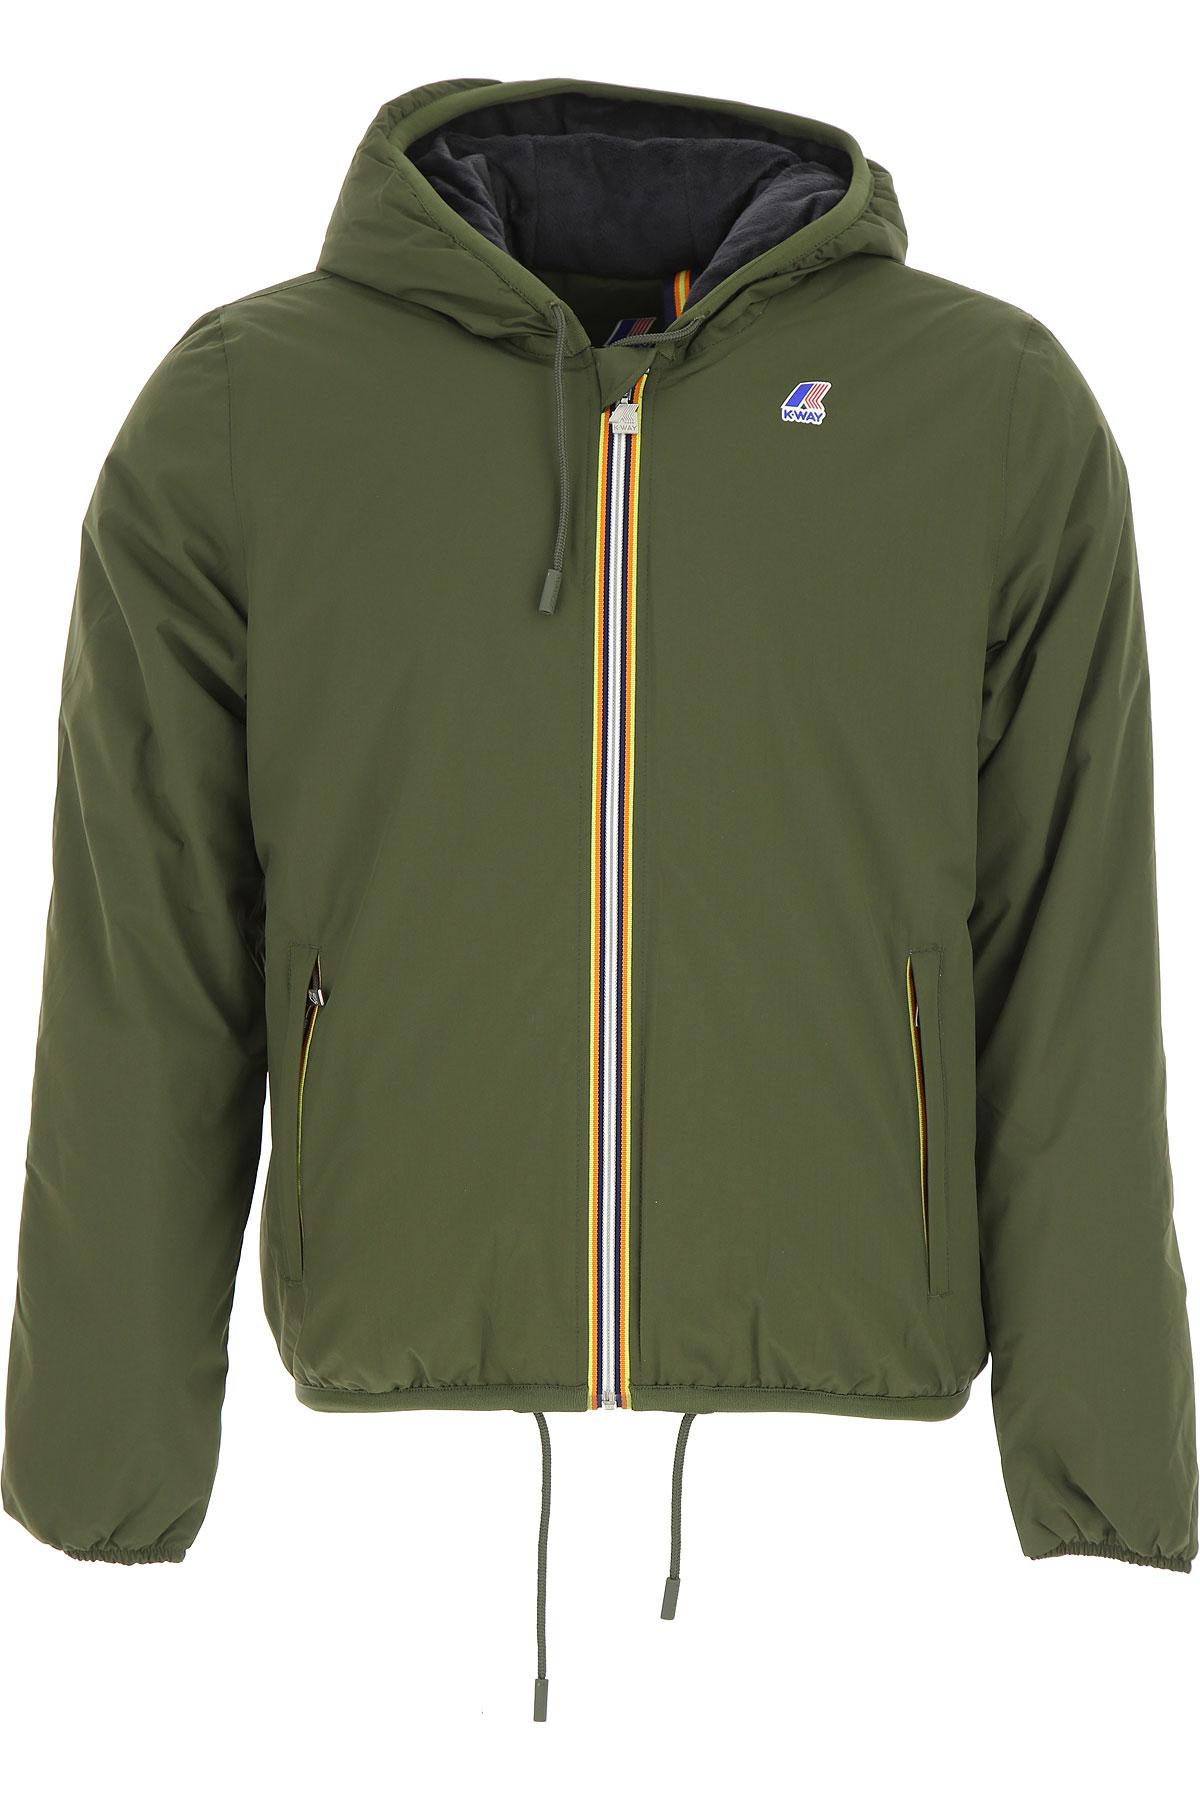 Image of K-Way Down Jacket for Men, Puffer Ski Jacket, Military Green, polyamide, 2017, S XL XXL